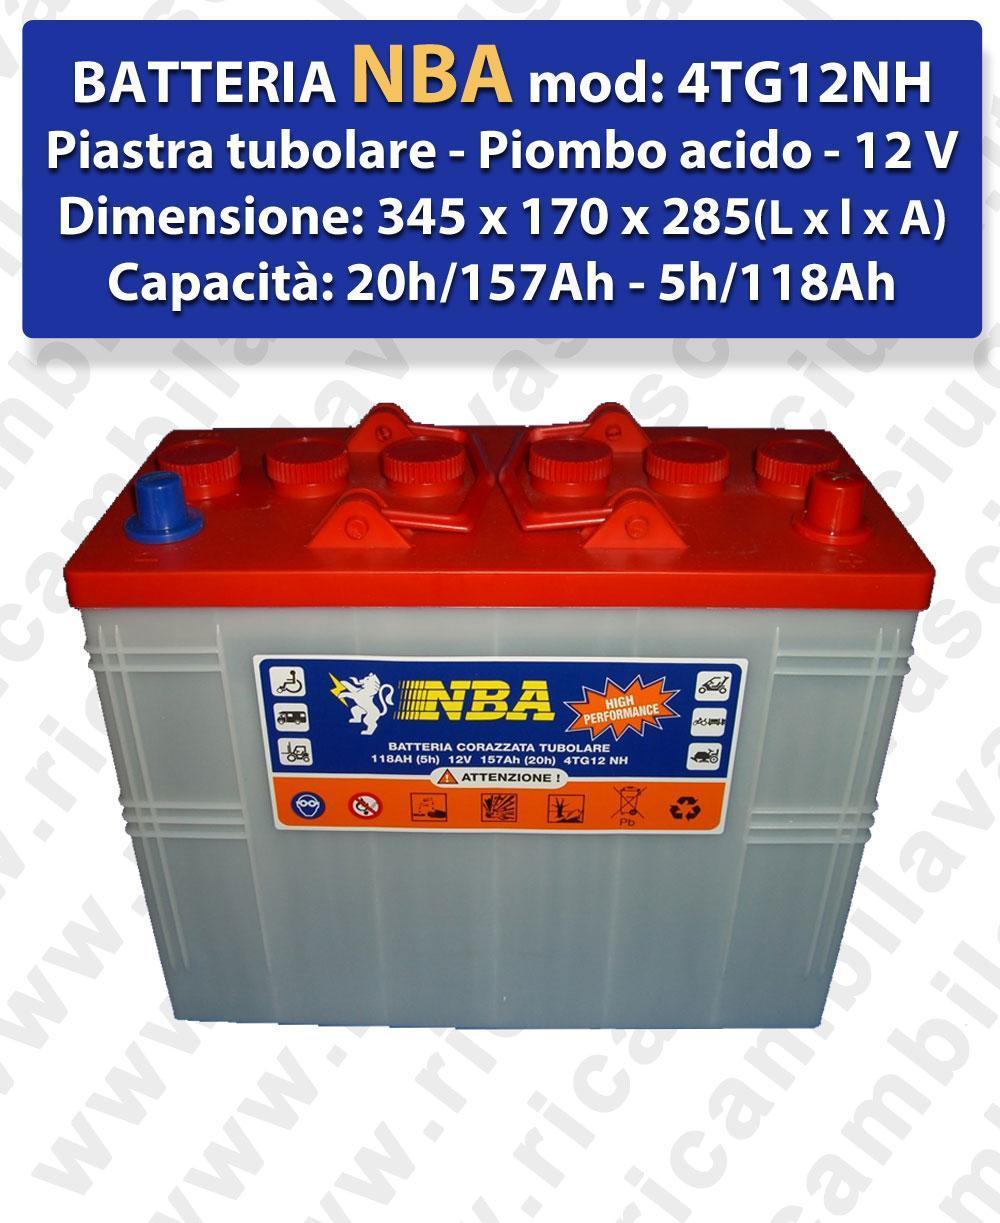 4TG12NH BATTERIE plombe - NBA 12V 120Ah 20/h